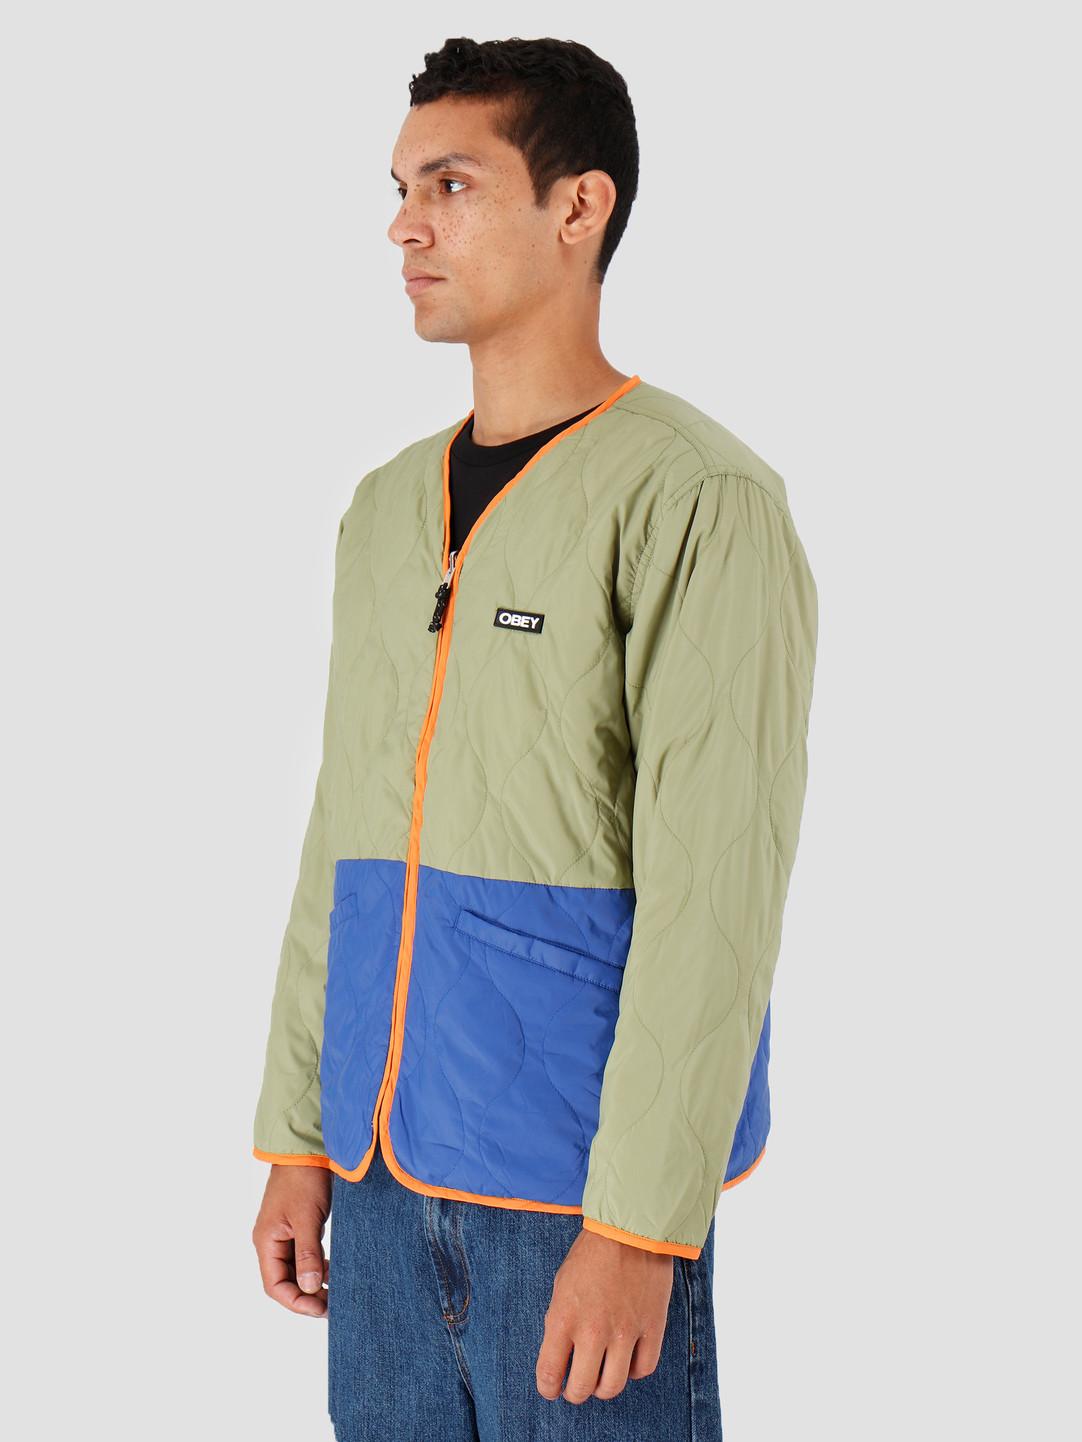 Obey Obey Nonsense Liner Jacket Burlap Multi 121800387-BUM